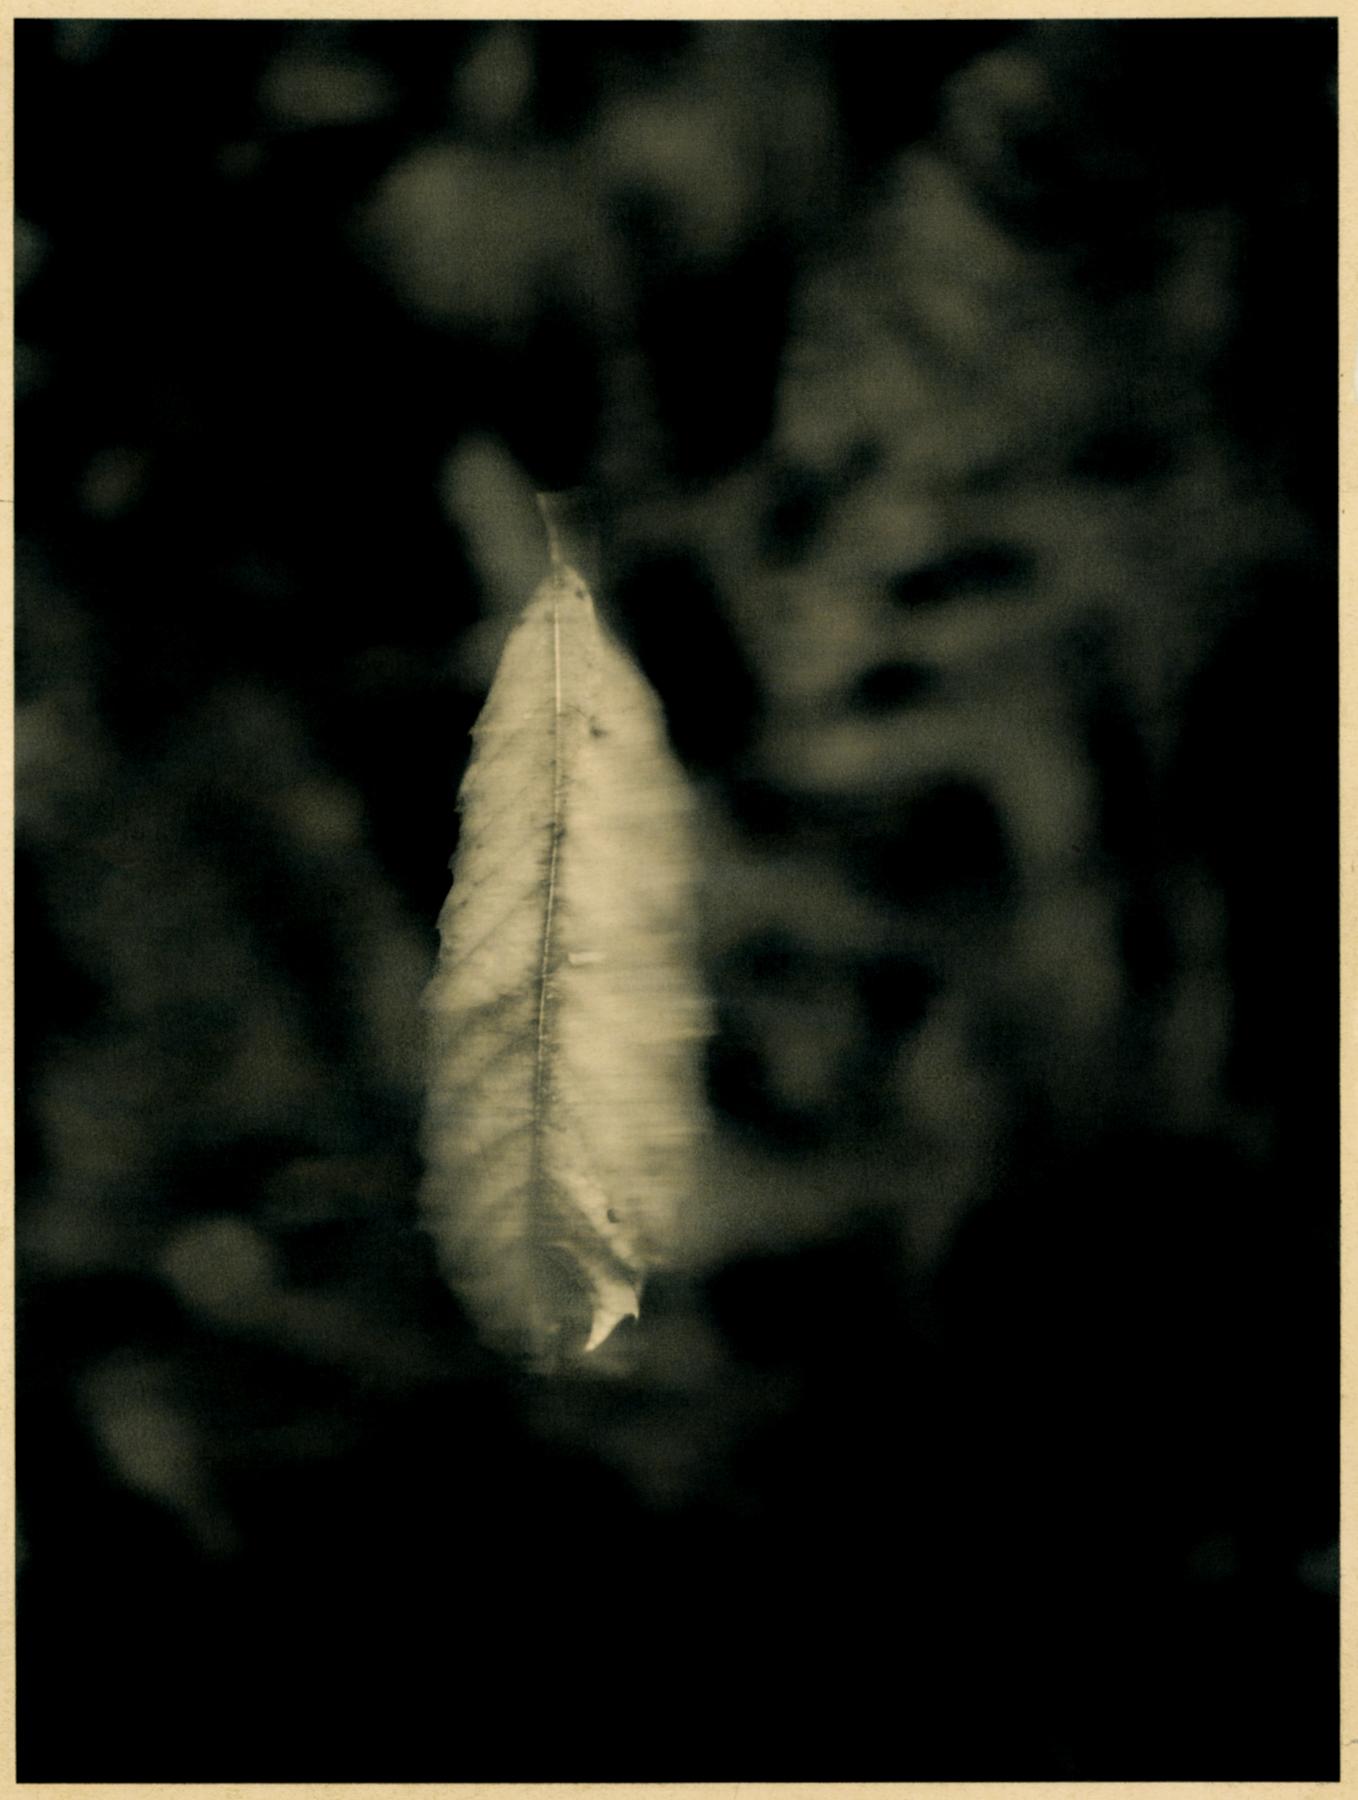 Rhonda_Lopez_Liable to Disappear_Falling_2.jpg